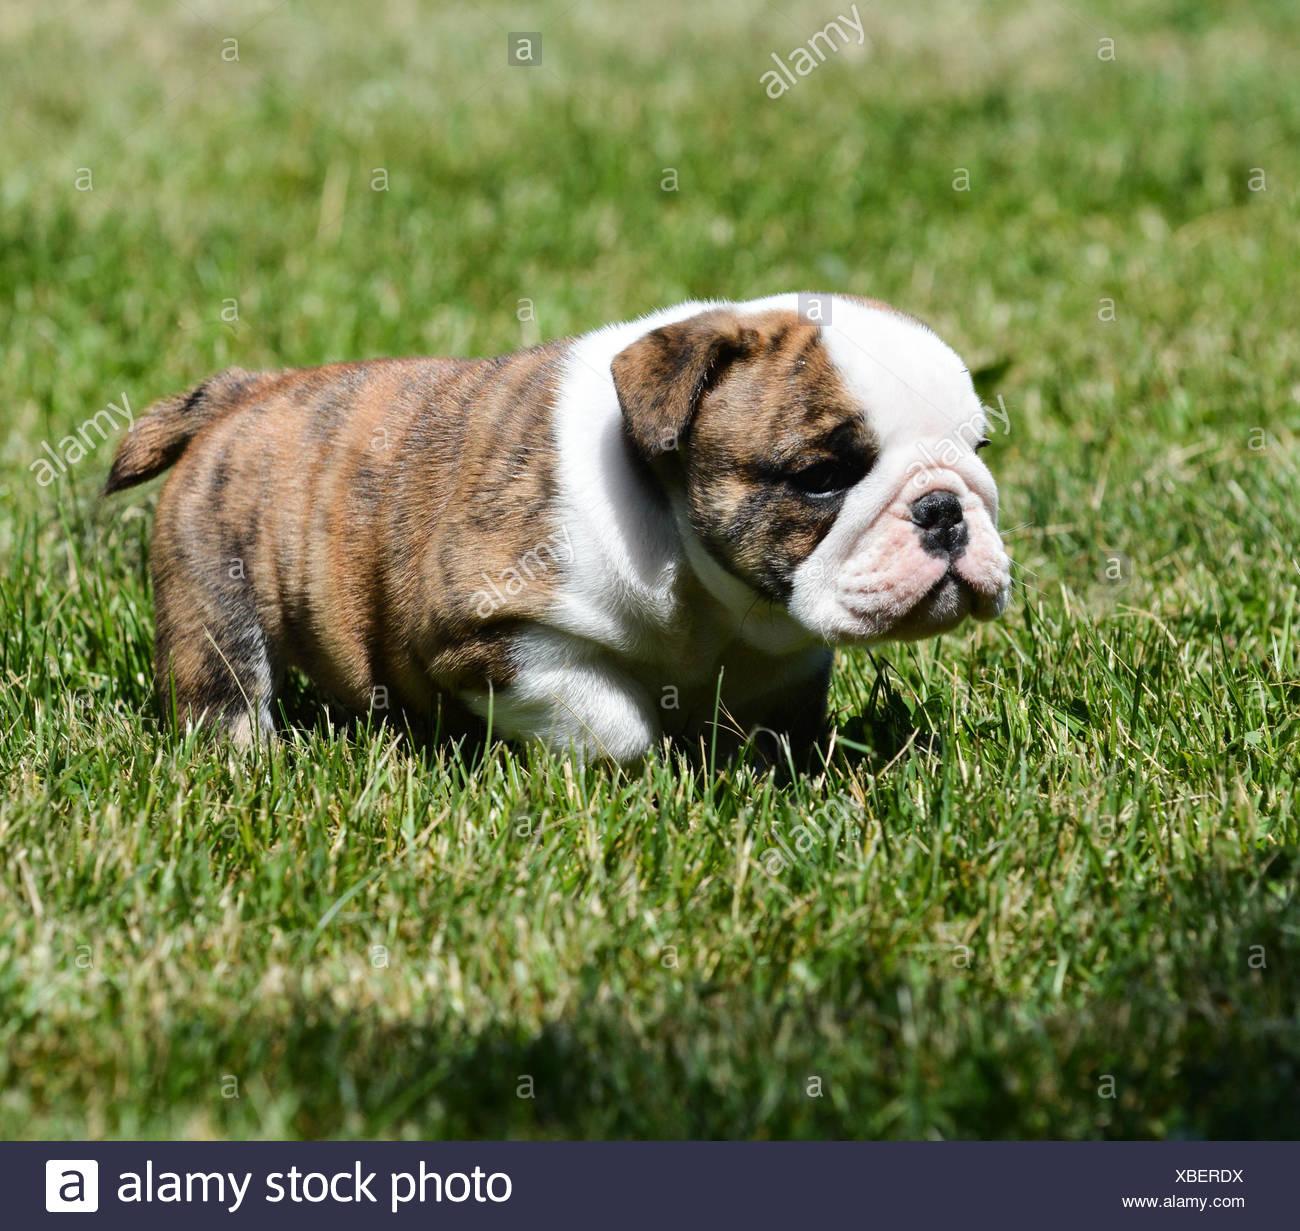 Cute English Bulldog Puppy In The Grass Stock Photo Alamy